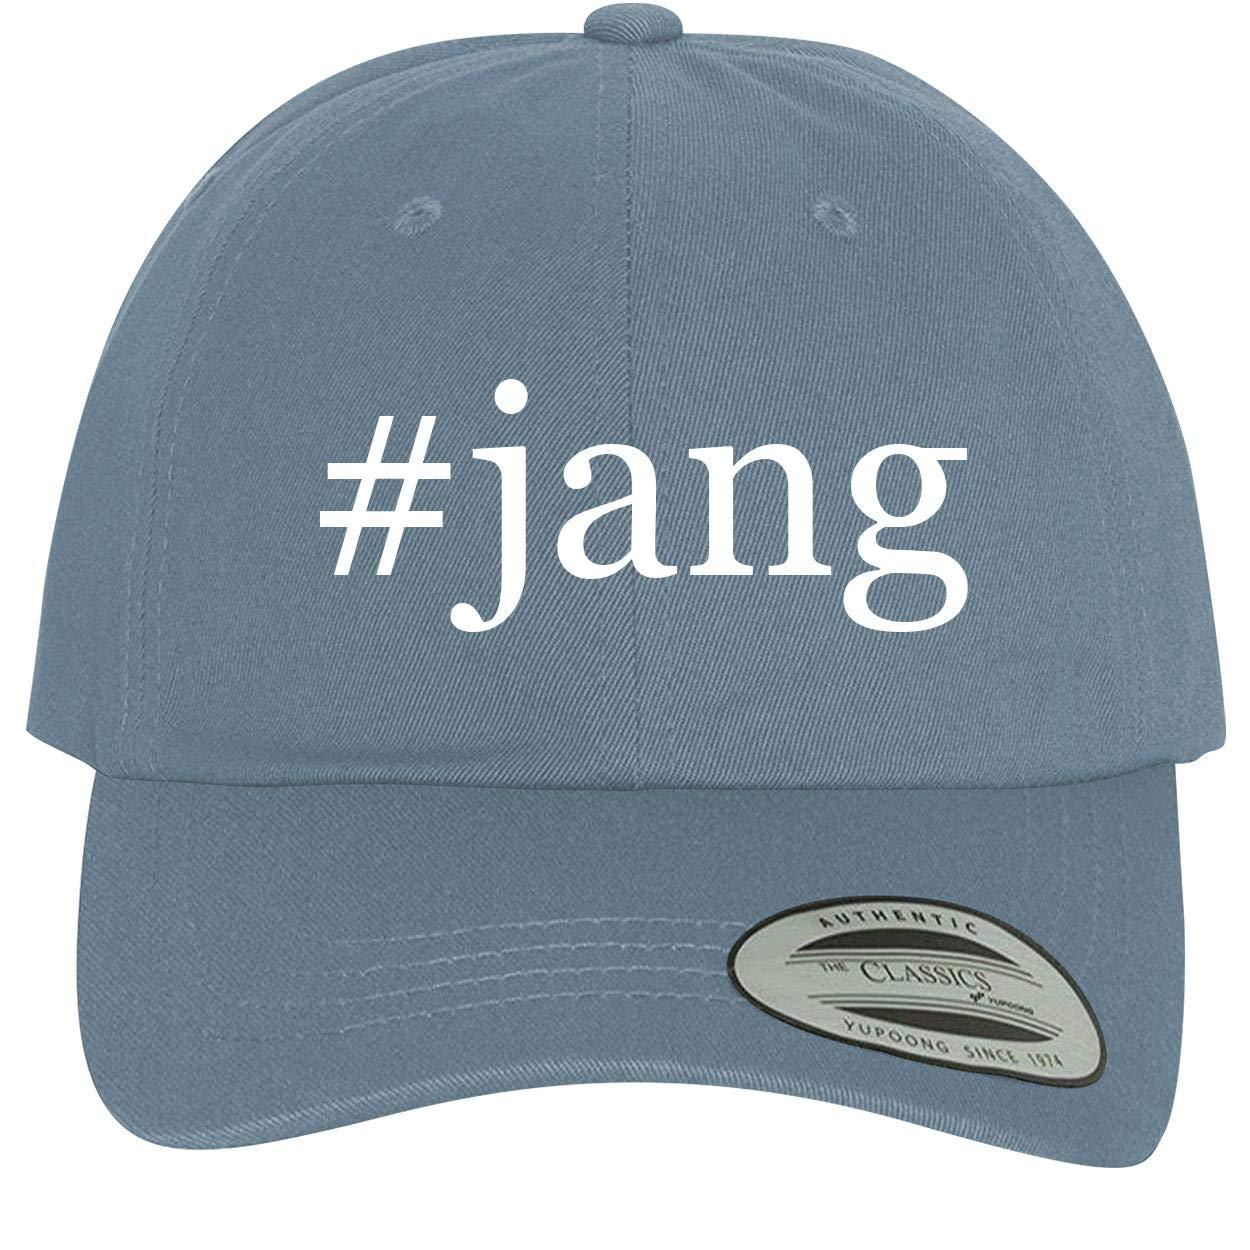 Comfortable Dad Hat Baseball Cap BH Cool Designs #Jang